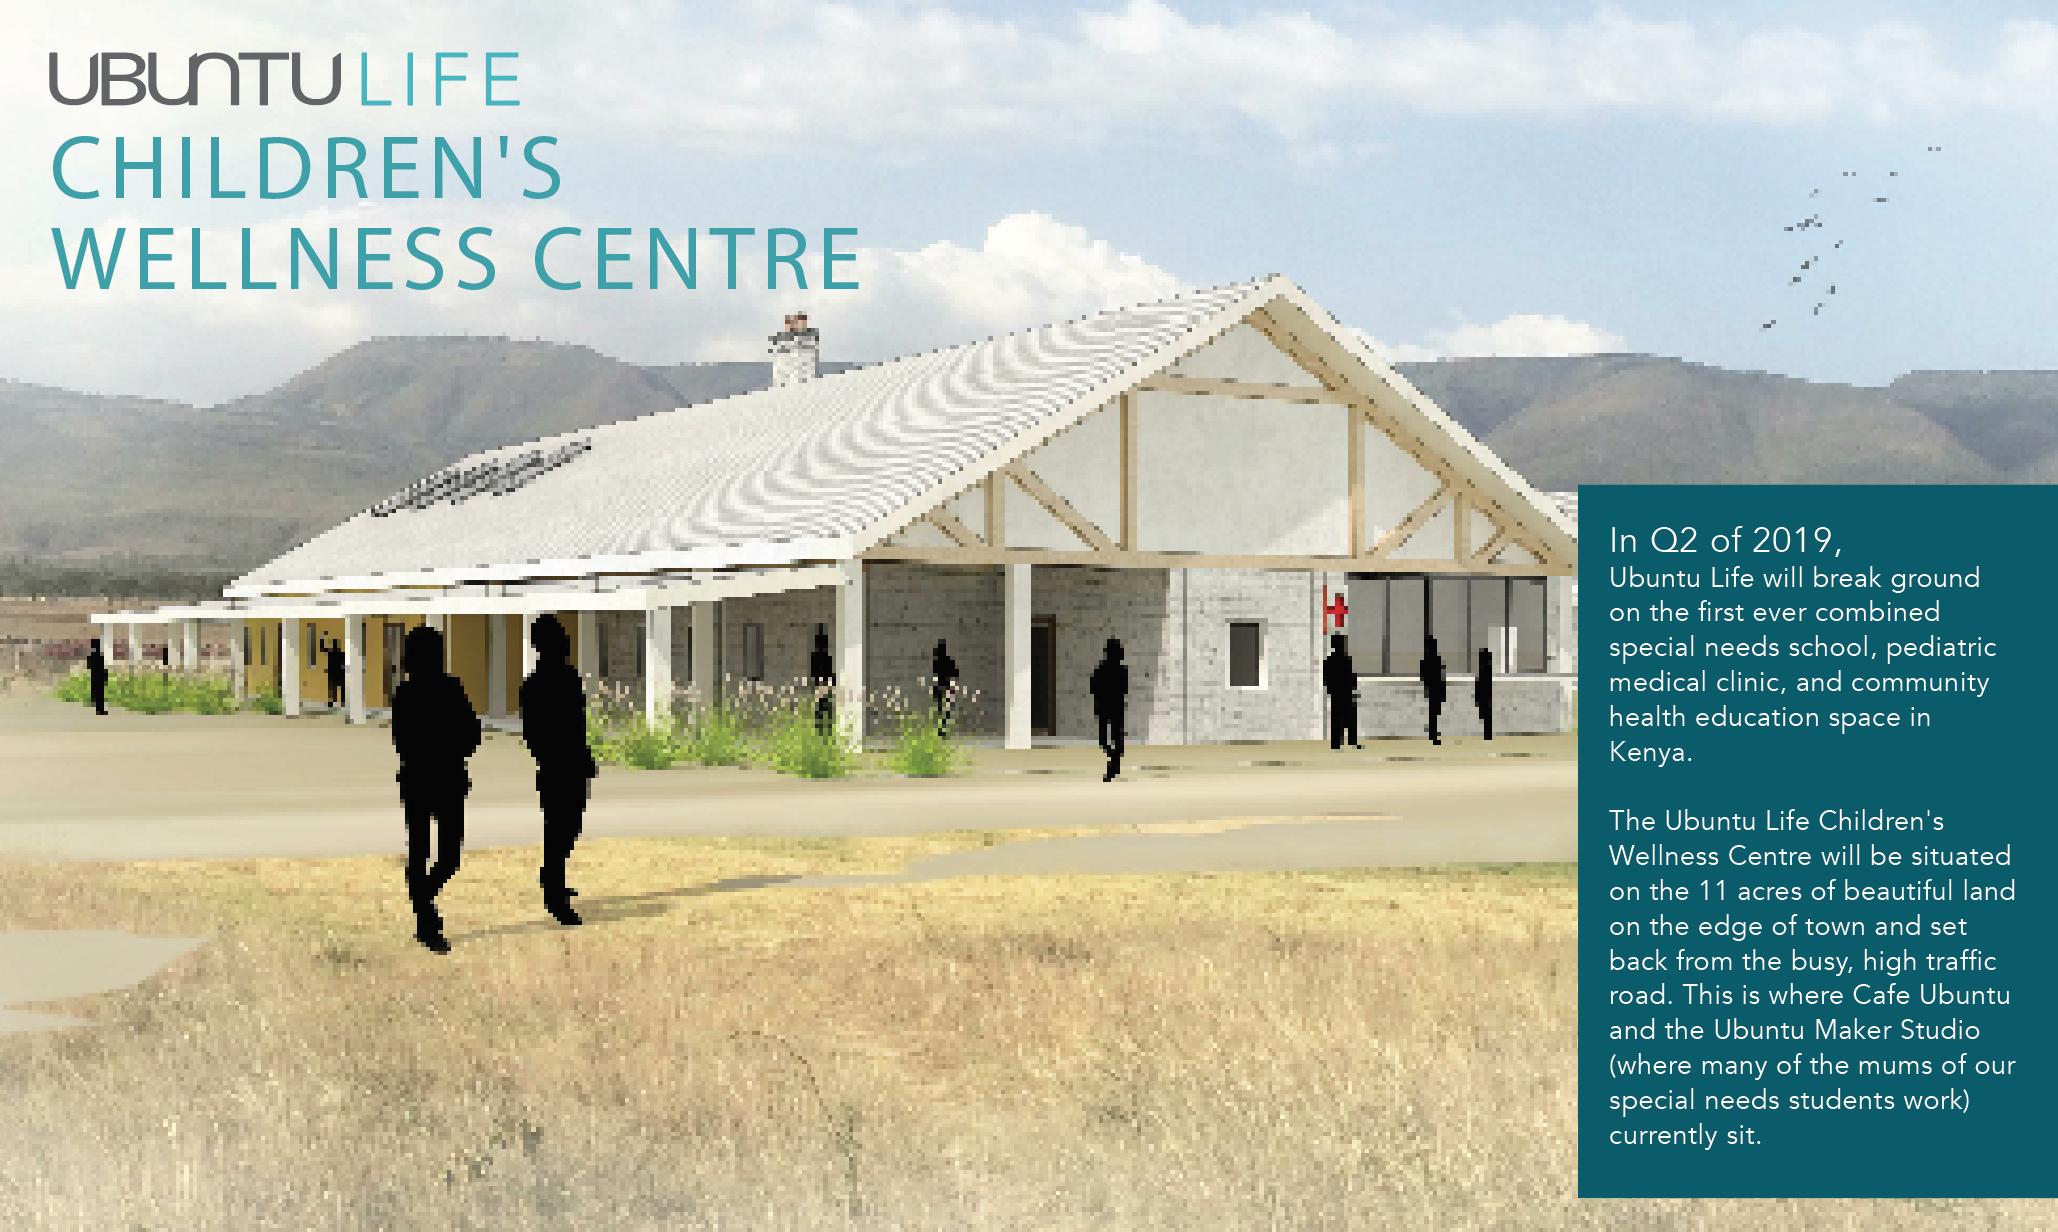 ubuntu life children wellness centre